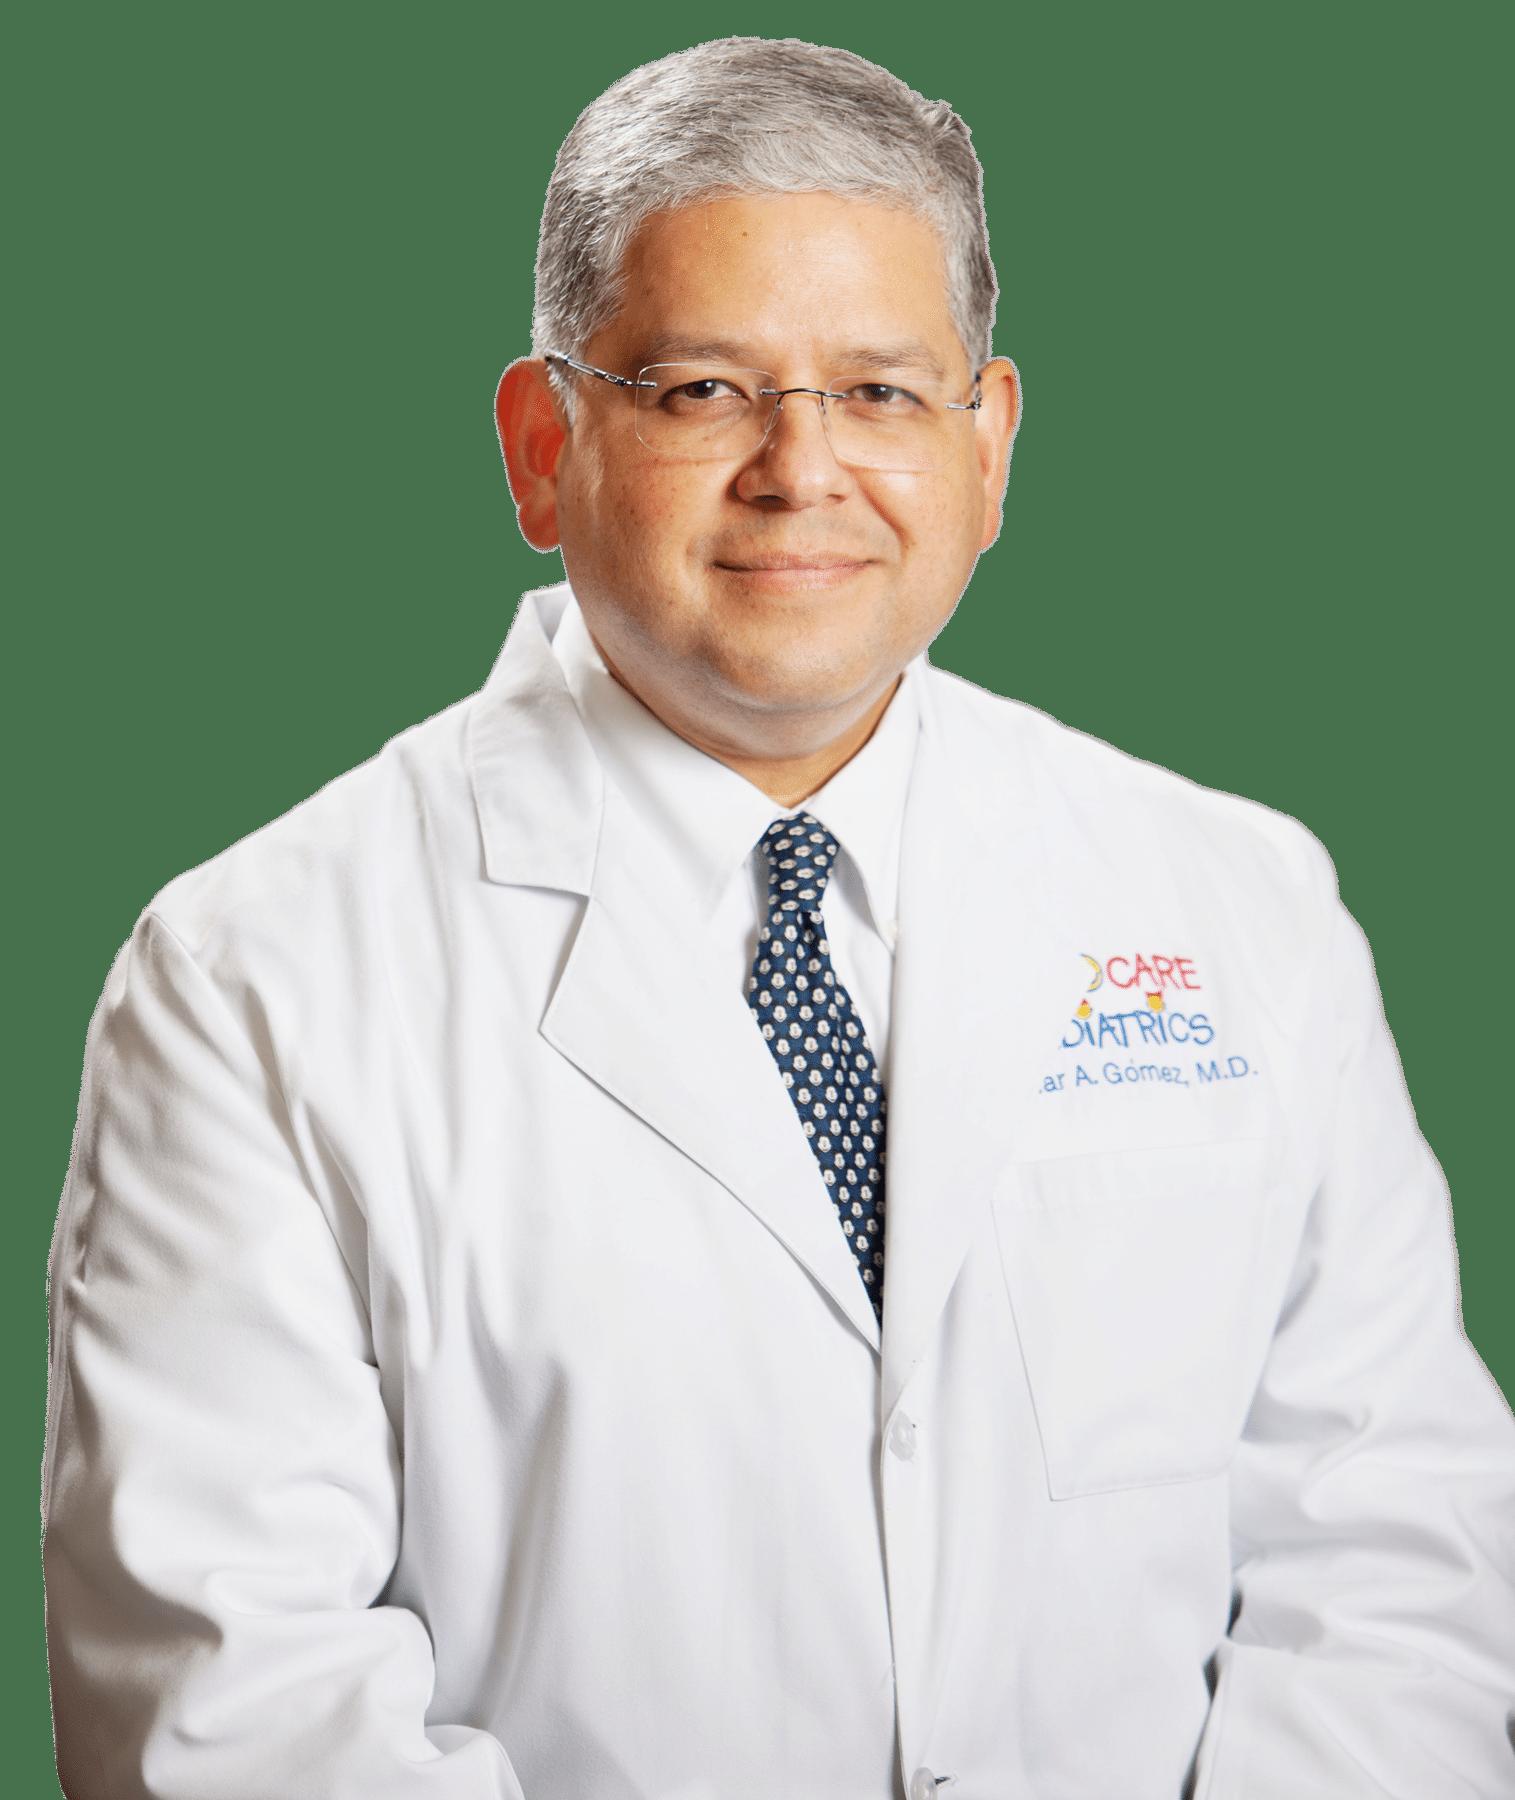 Dr. Omar A. Gomez at Kid Care Pediatrics